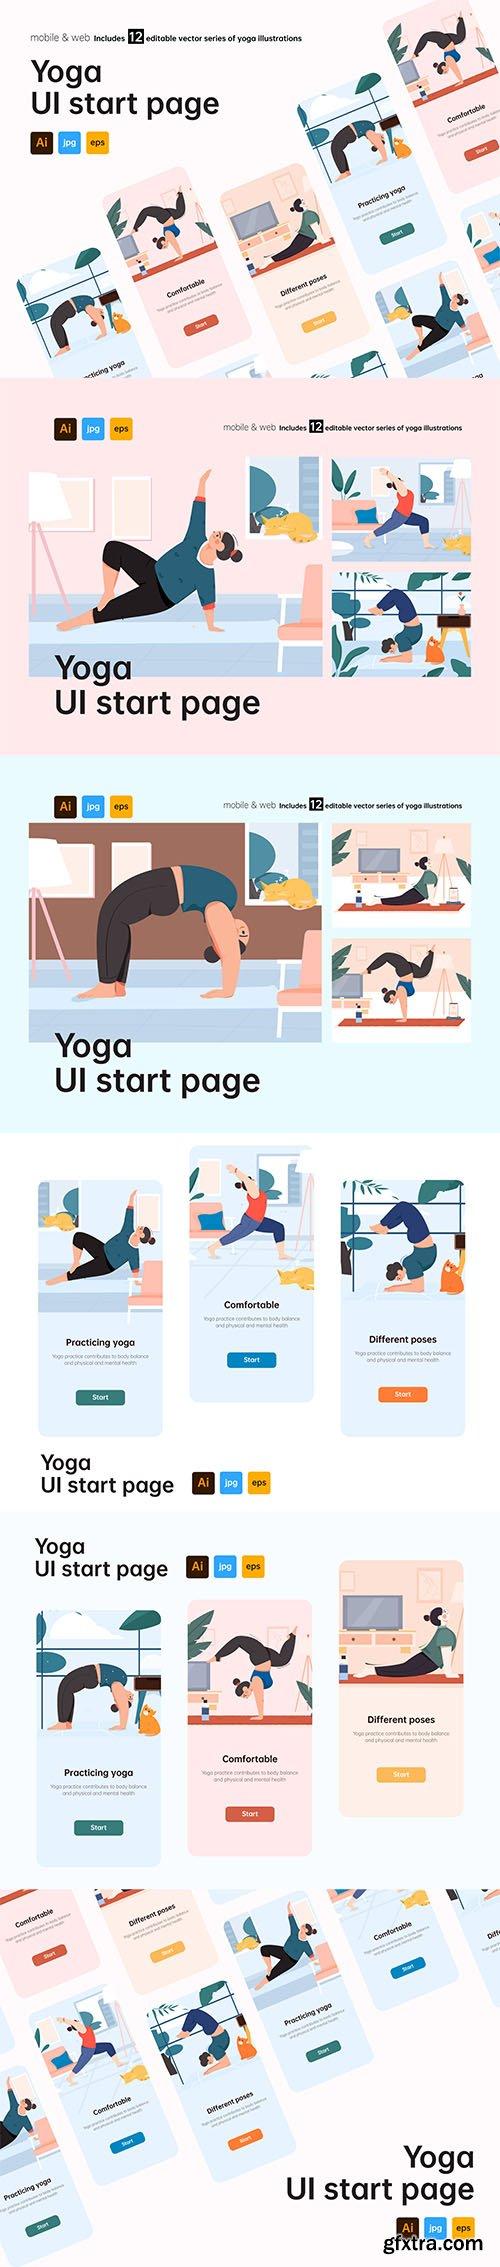 Yoga UI start page